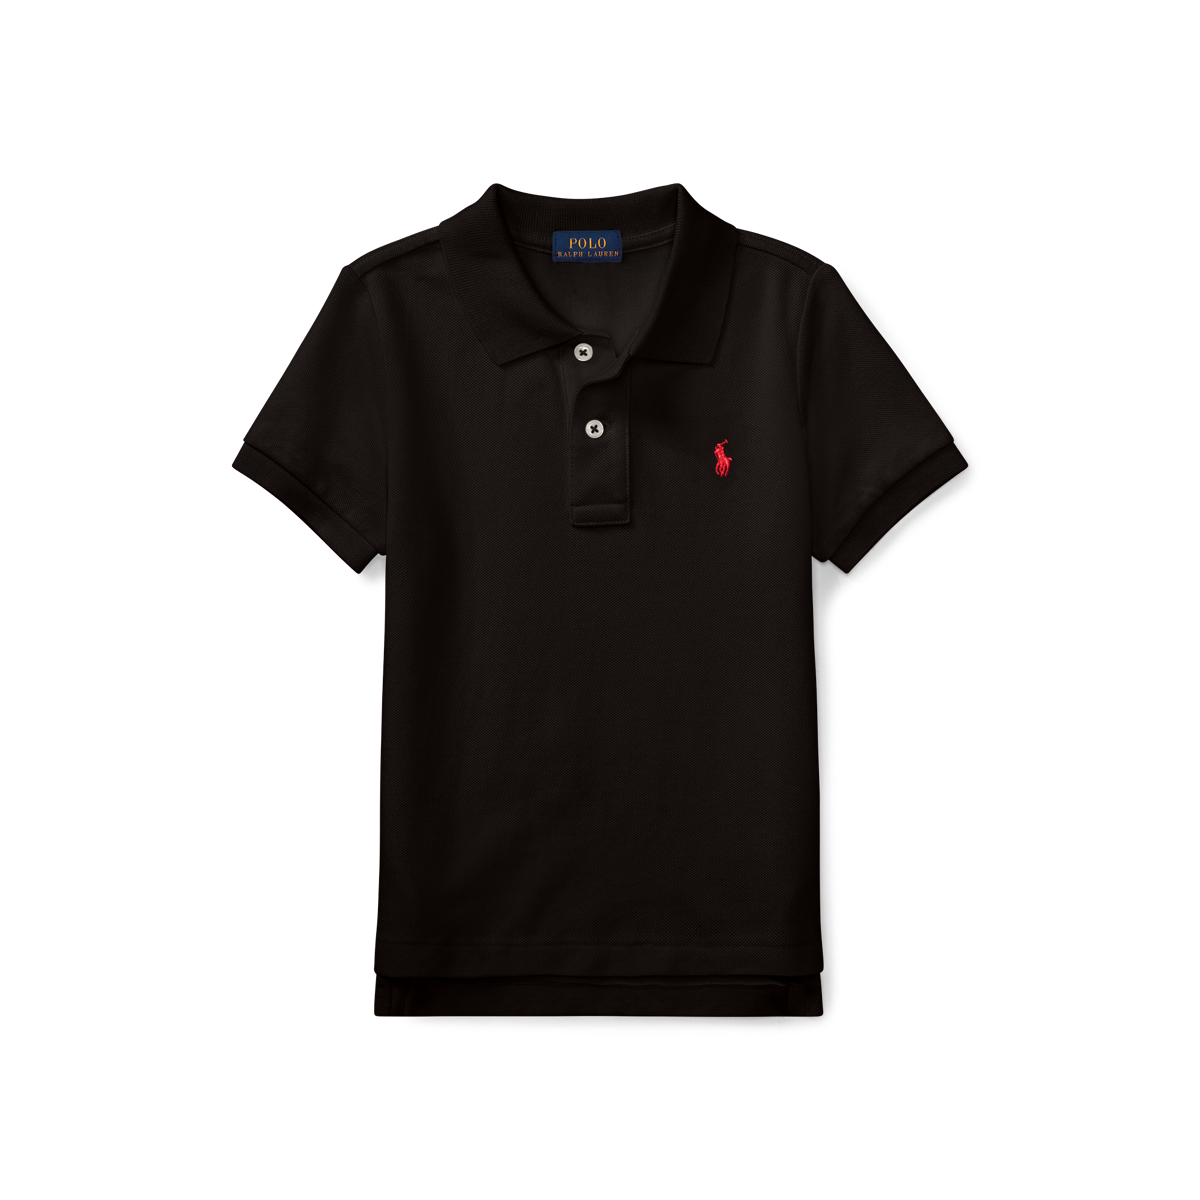 f4978c932a061 Cotton Mesh Polo Shirt